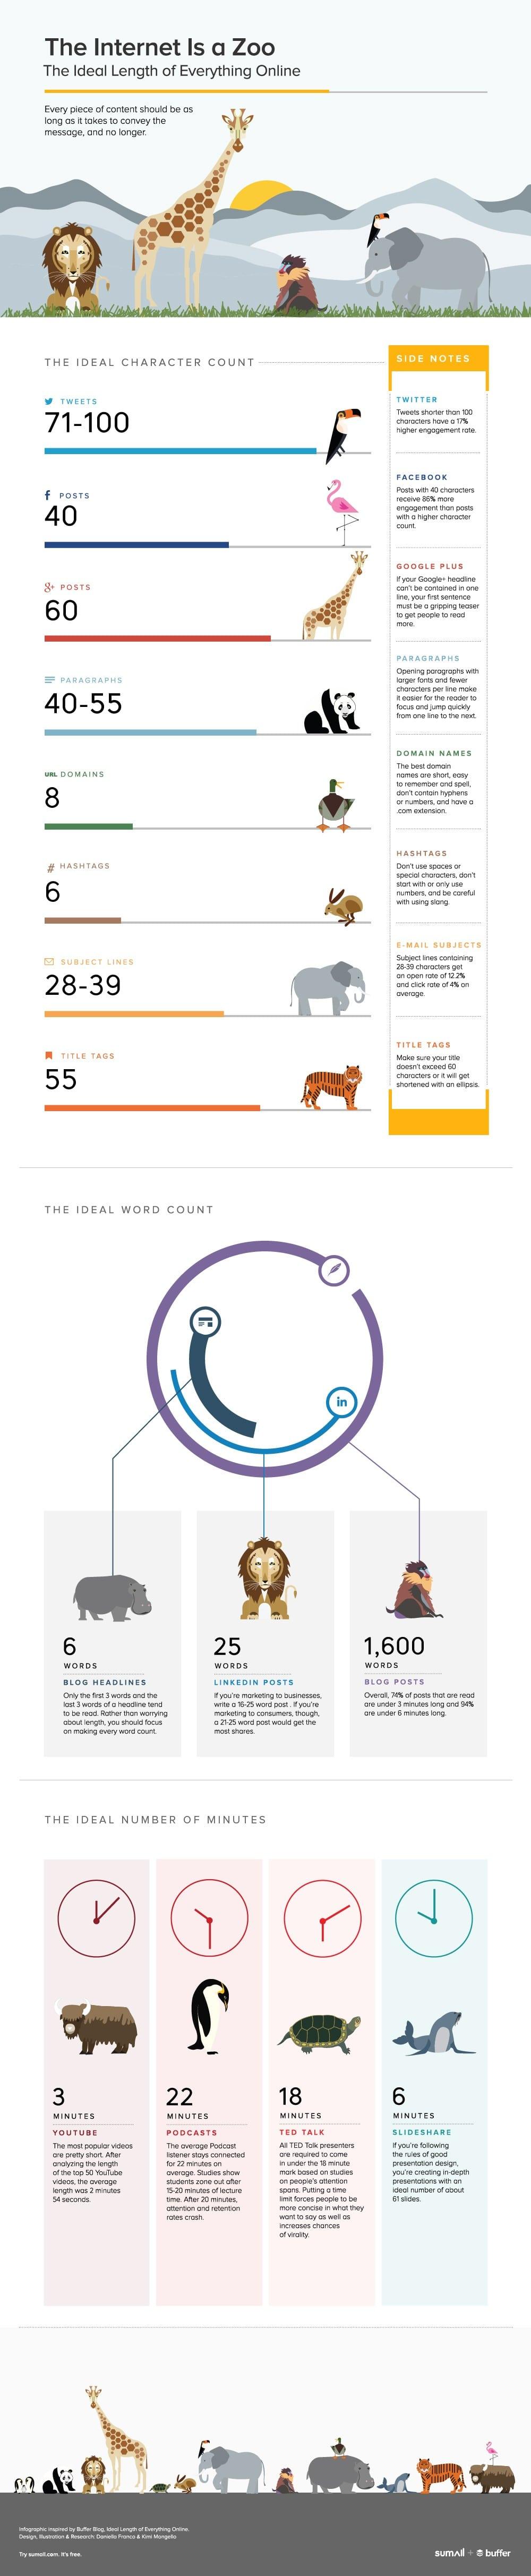 social-media-length-infographic